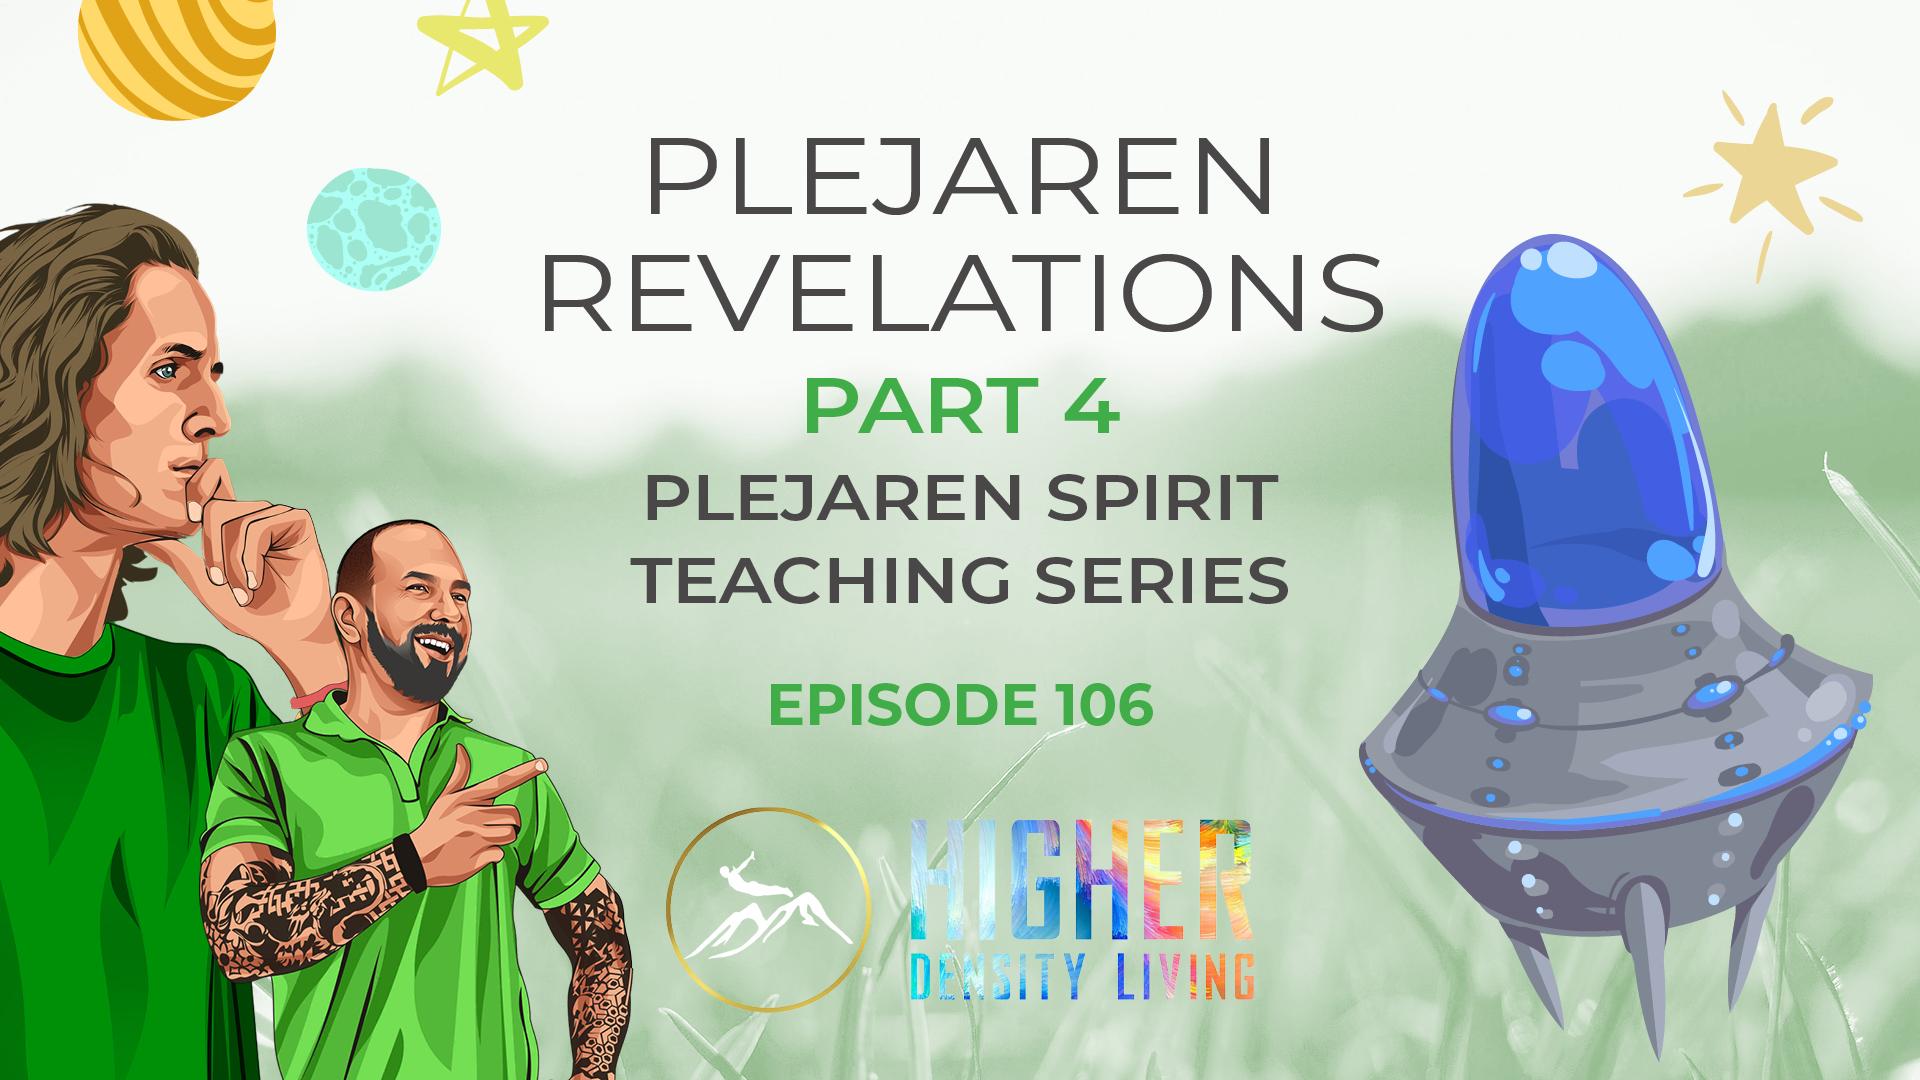 Plejaren Revelations Part 4 - Plejaren Spirit Teaching Series